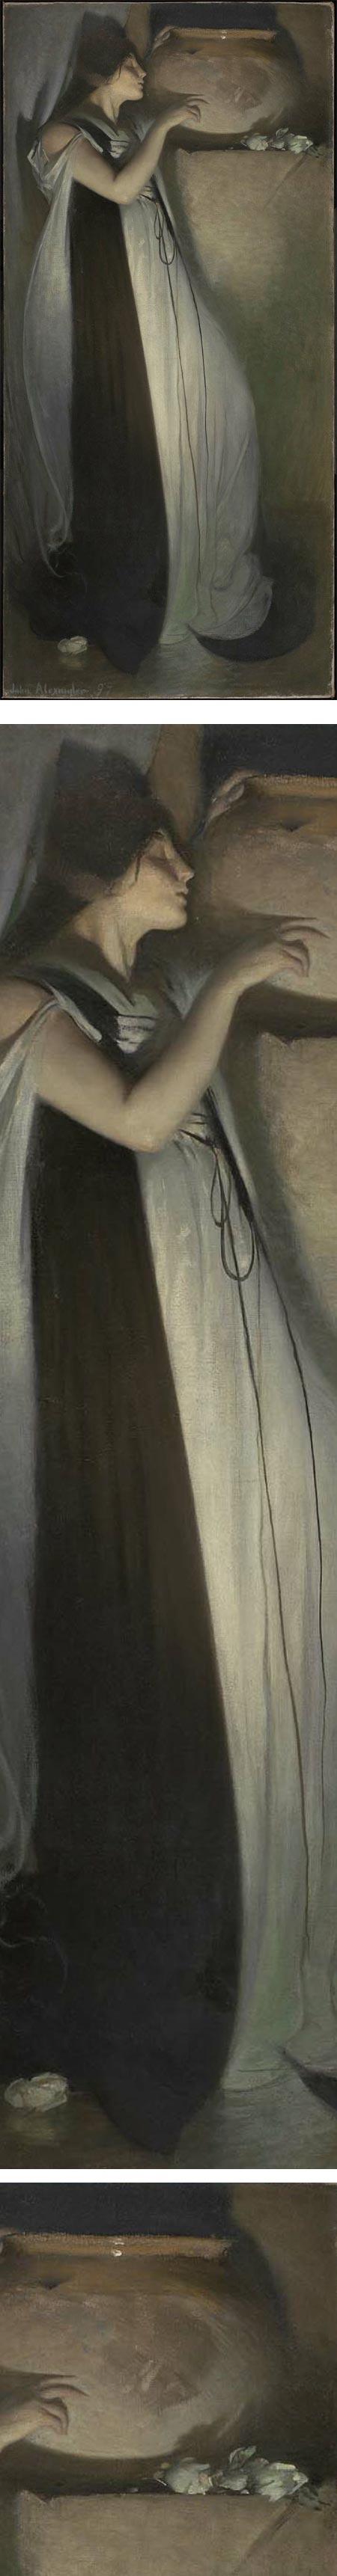 Isabella and the Pot of Basil, John White Alexander